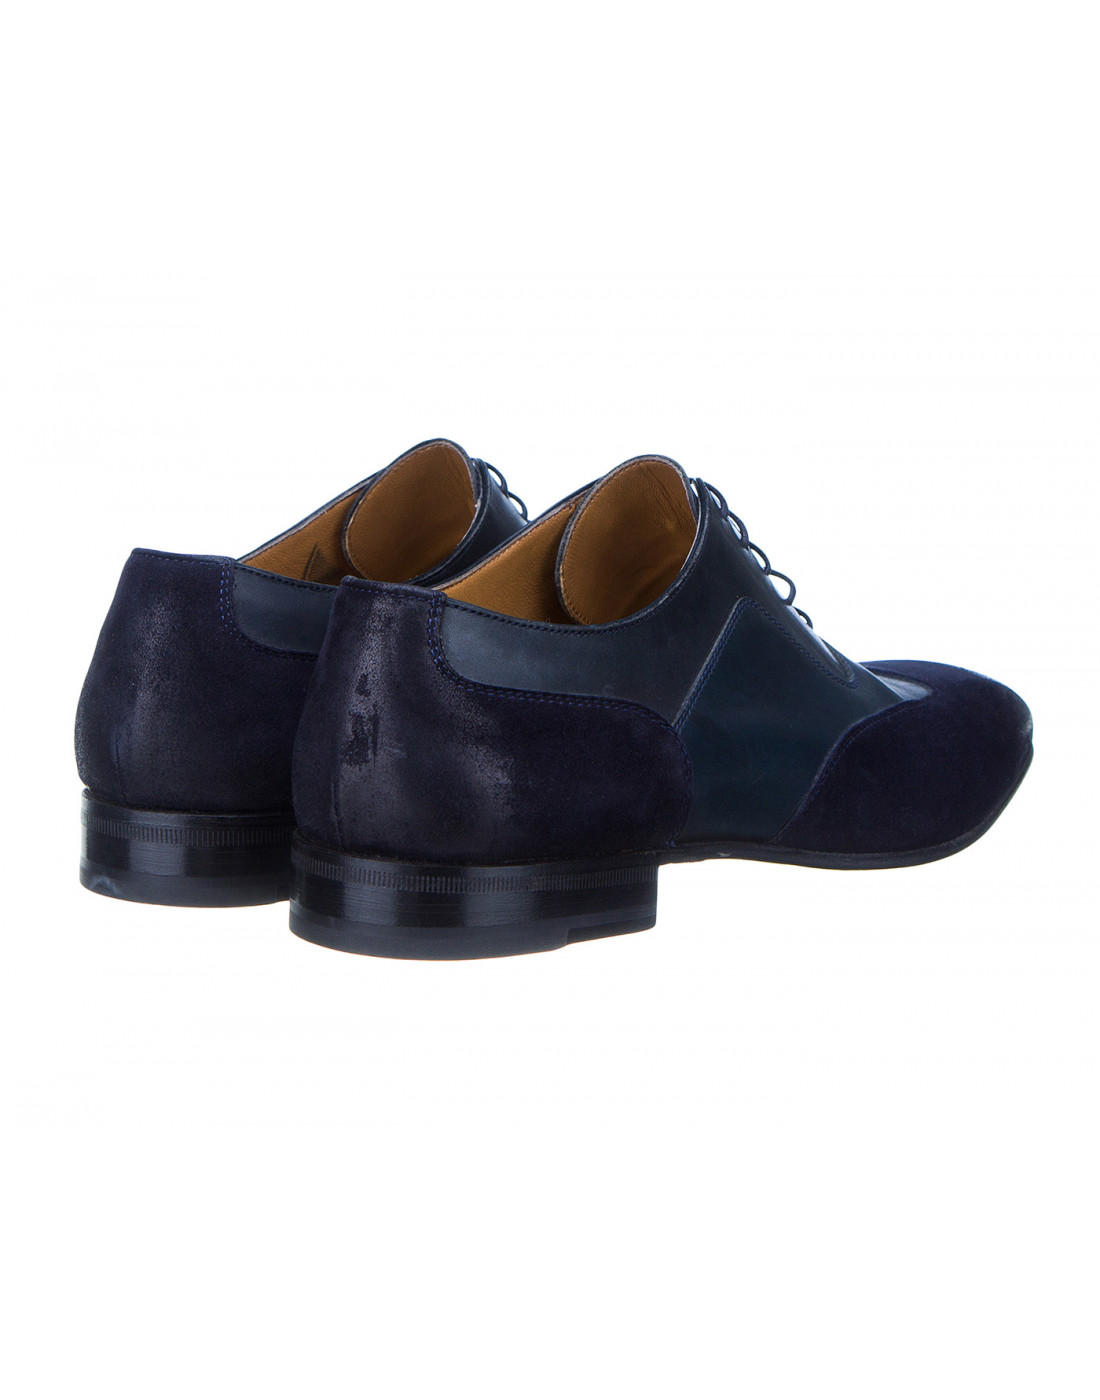 Туфли синие мужские Moreschi S42619 BLUE-3